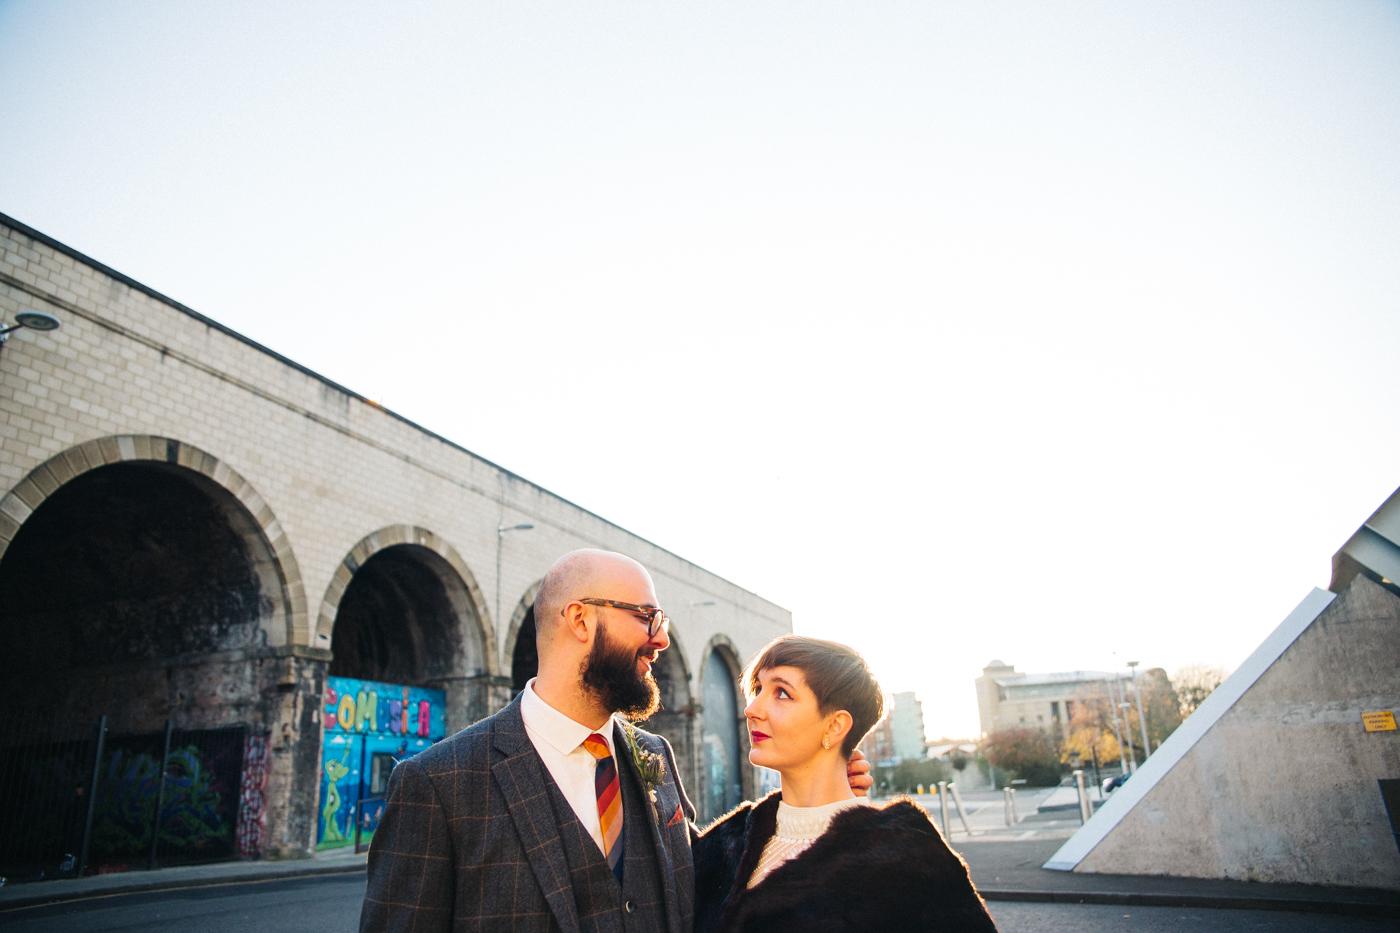 teesside-newcastle-gateshead-wedding-photography-photographer-creative-0069.jpg